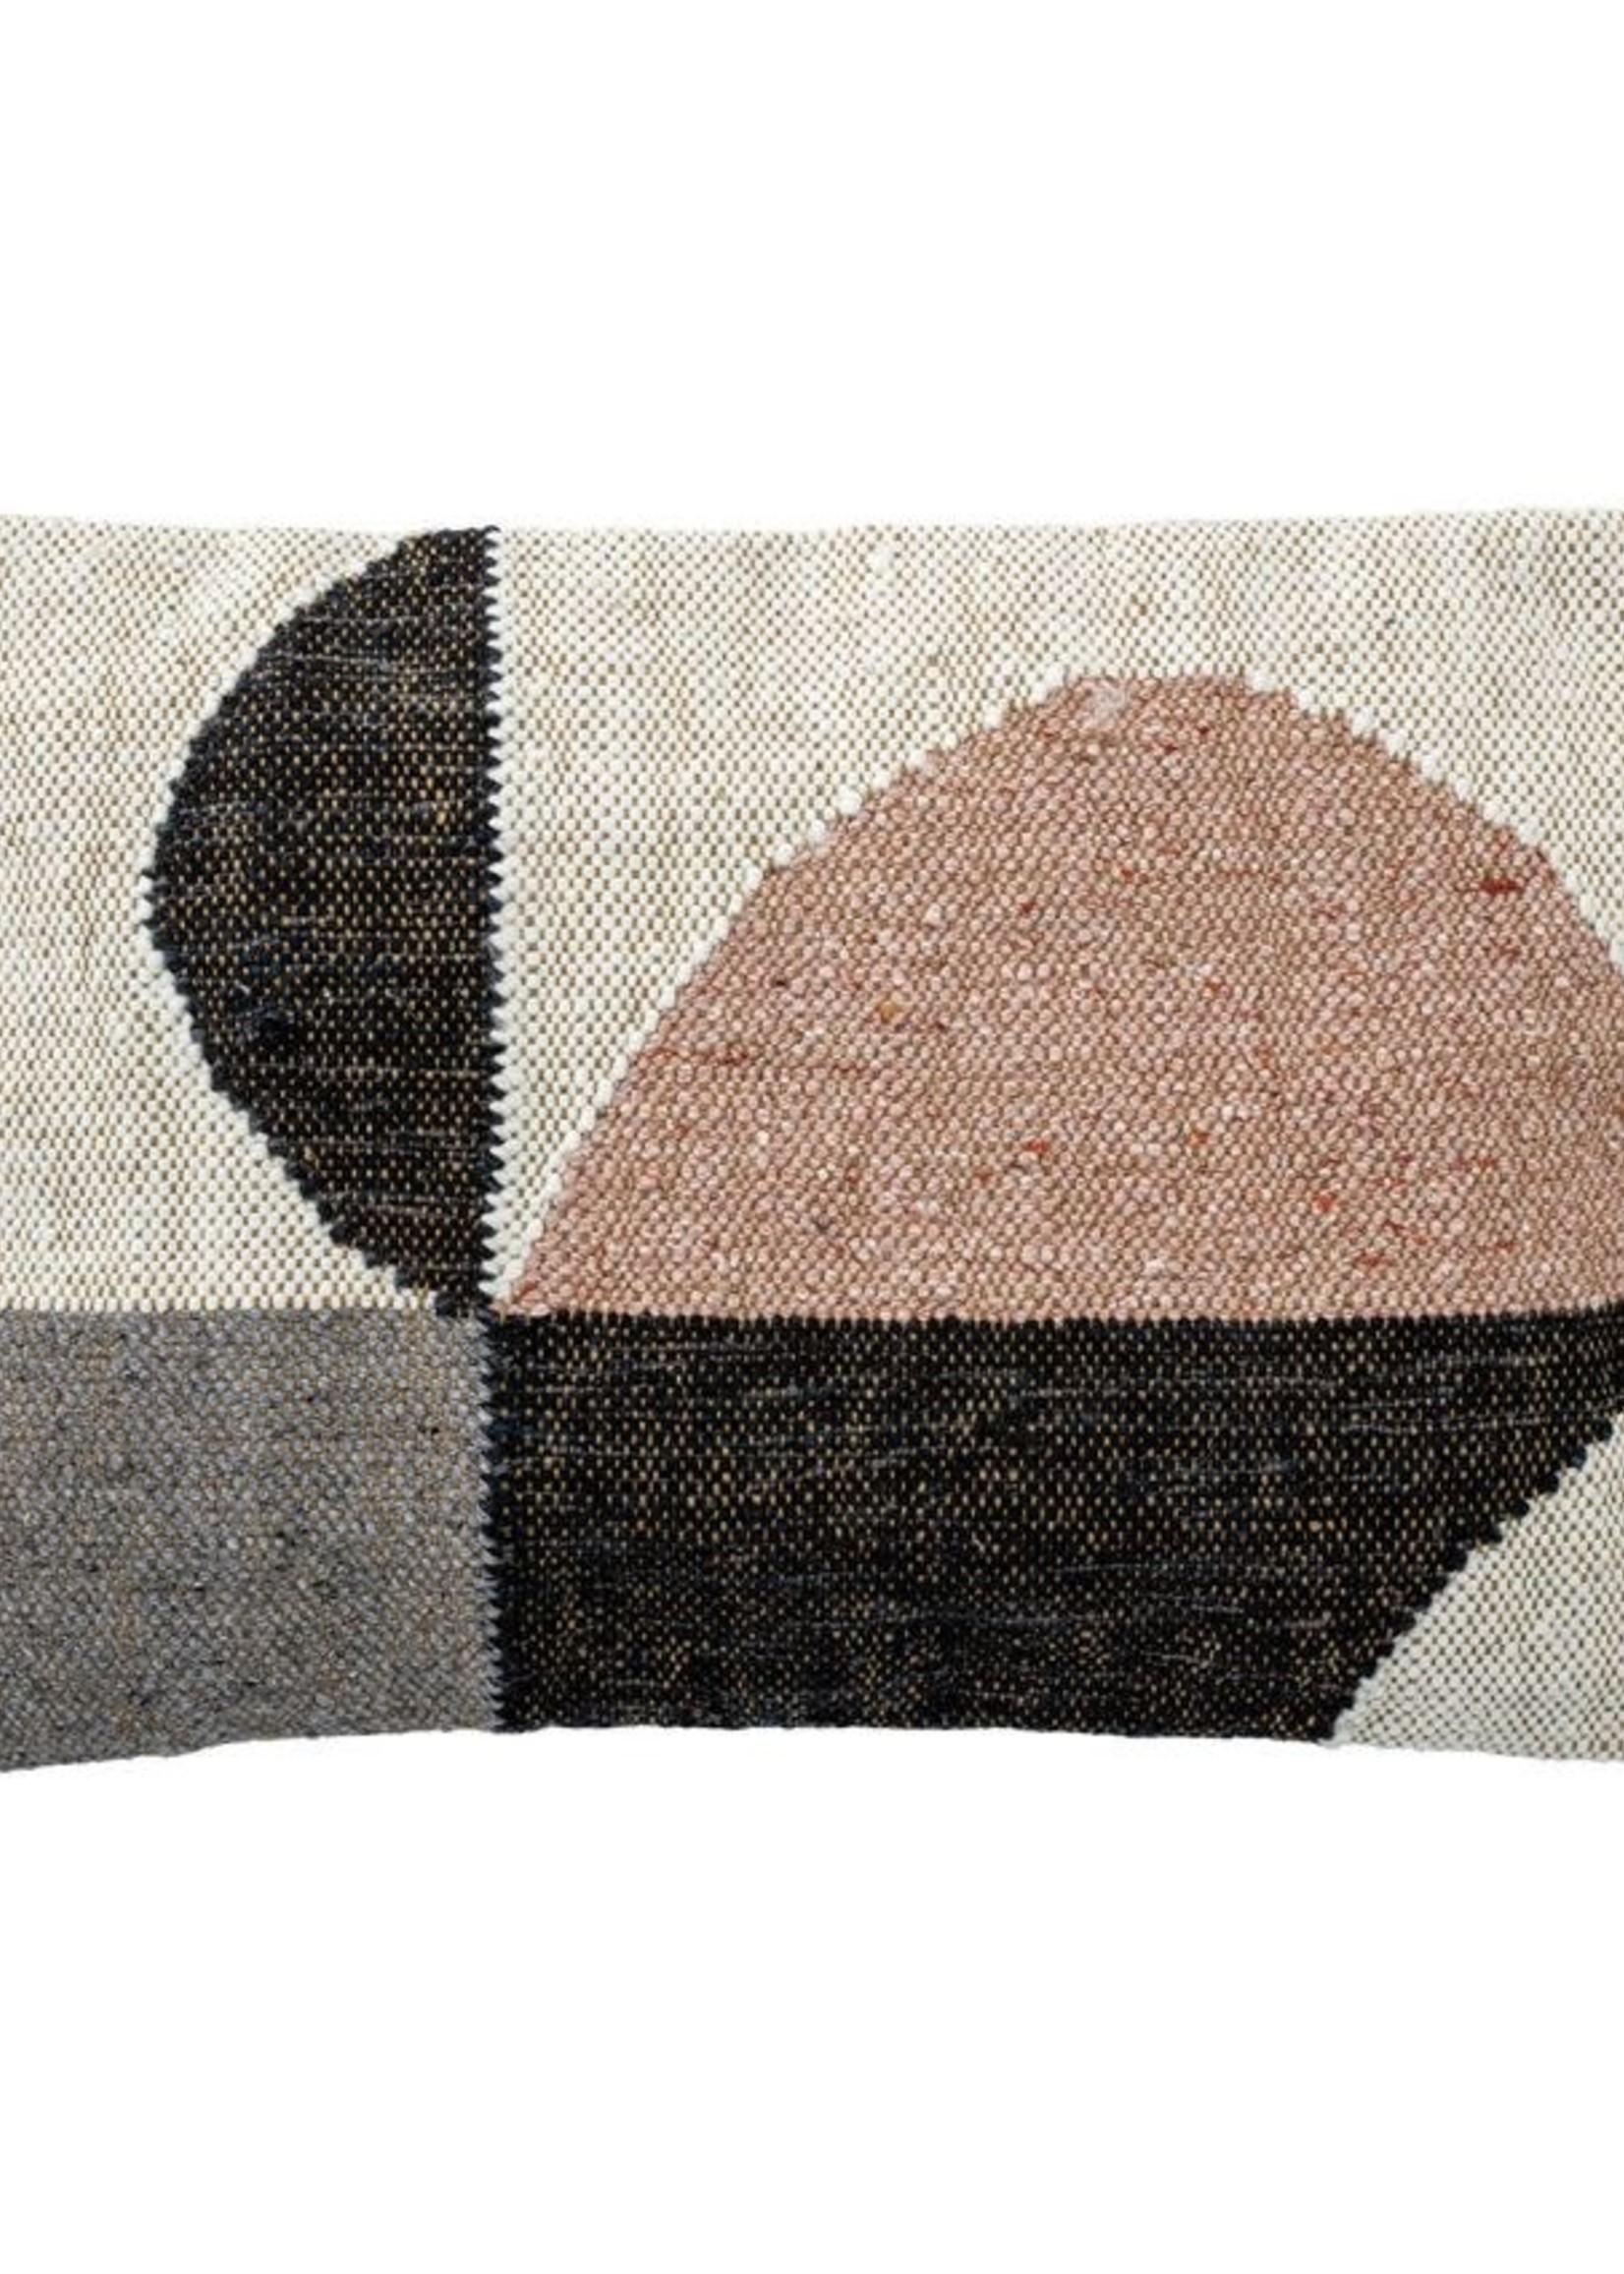 "24""L x 16""H Woven Cotton Lumbar Pillow, Multi Color"